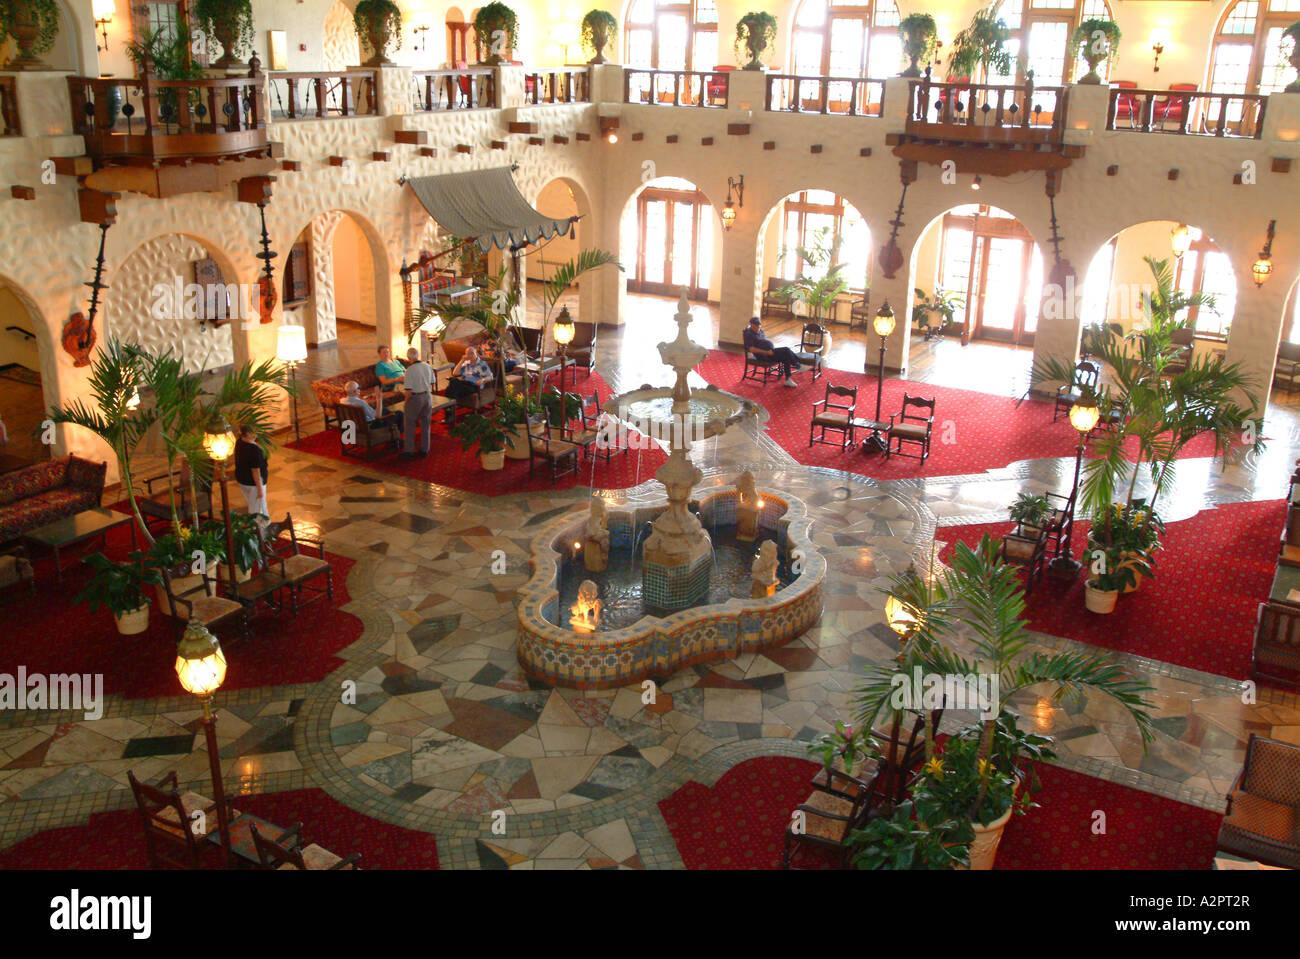 usa-pennsylvania-pa-hershey-hotel-hershe